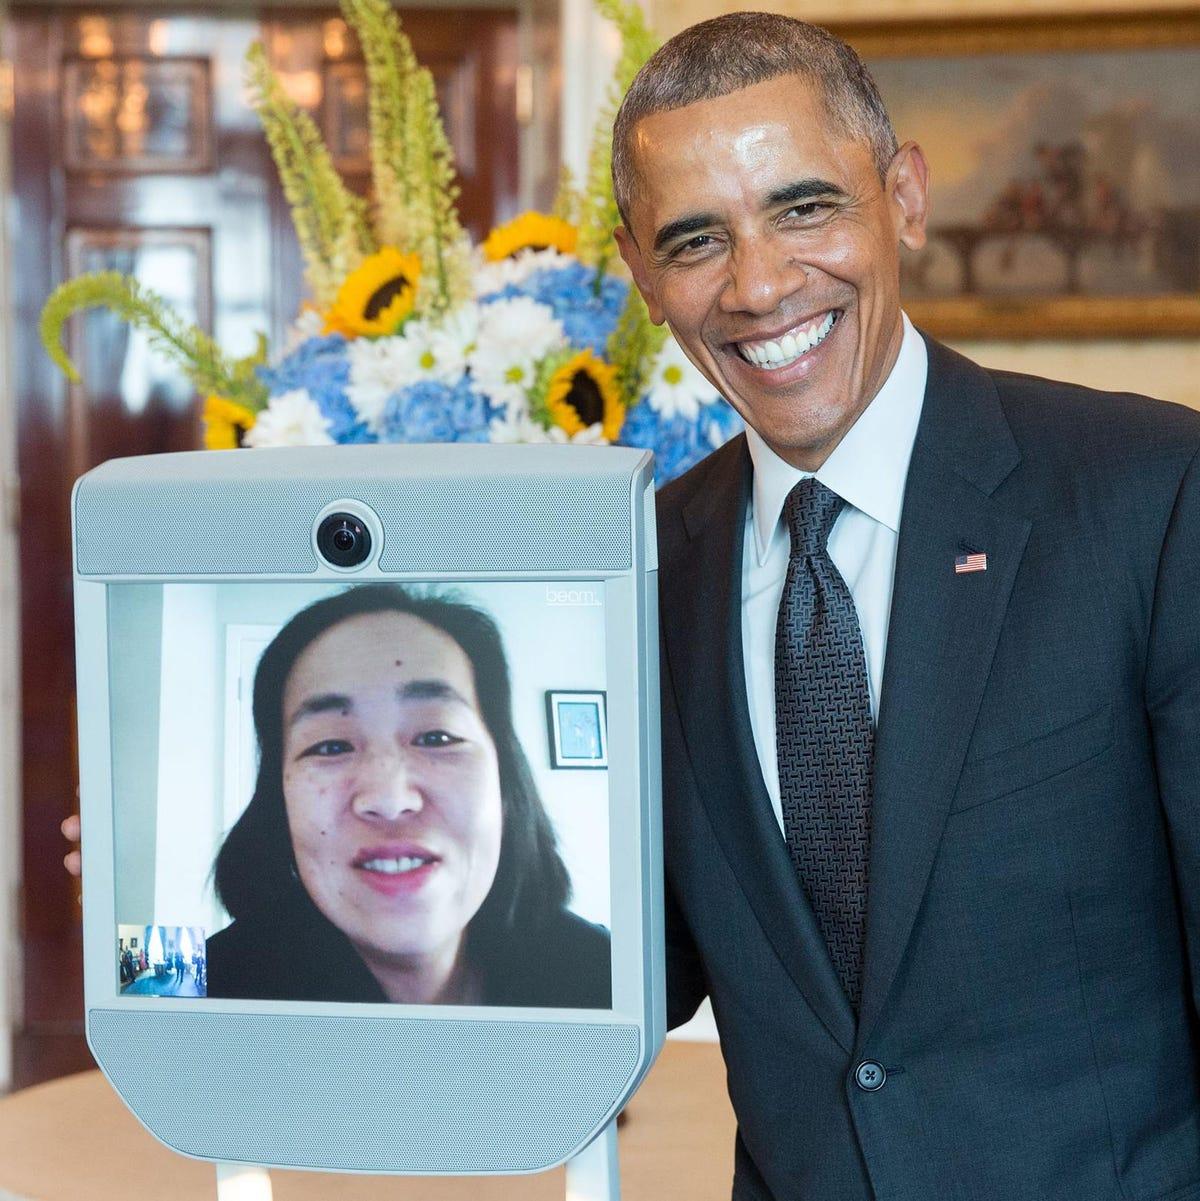 obama-beamportrait1.jpg